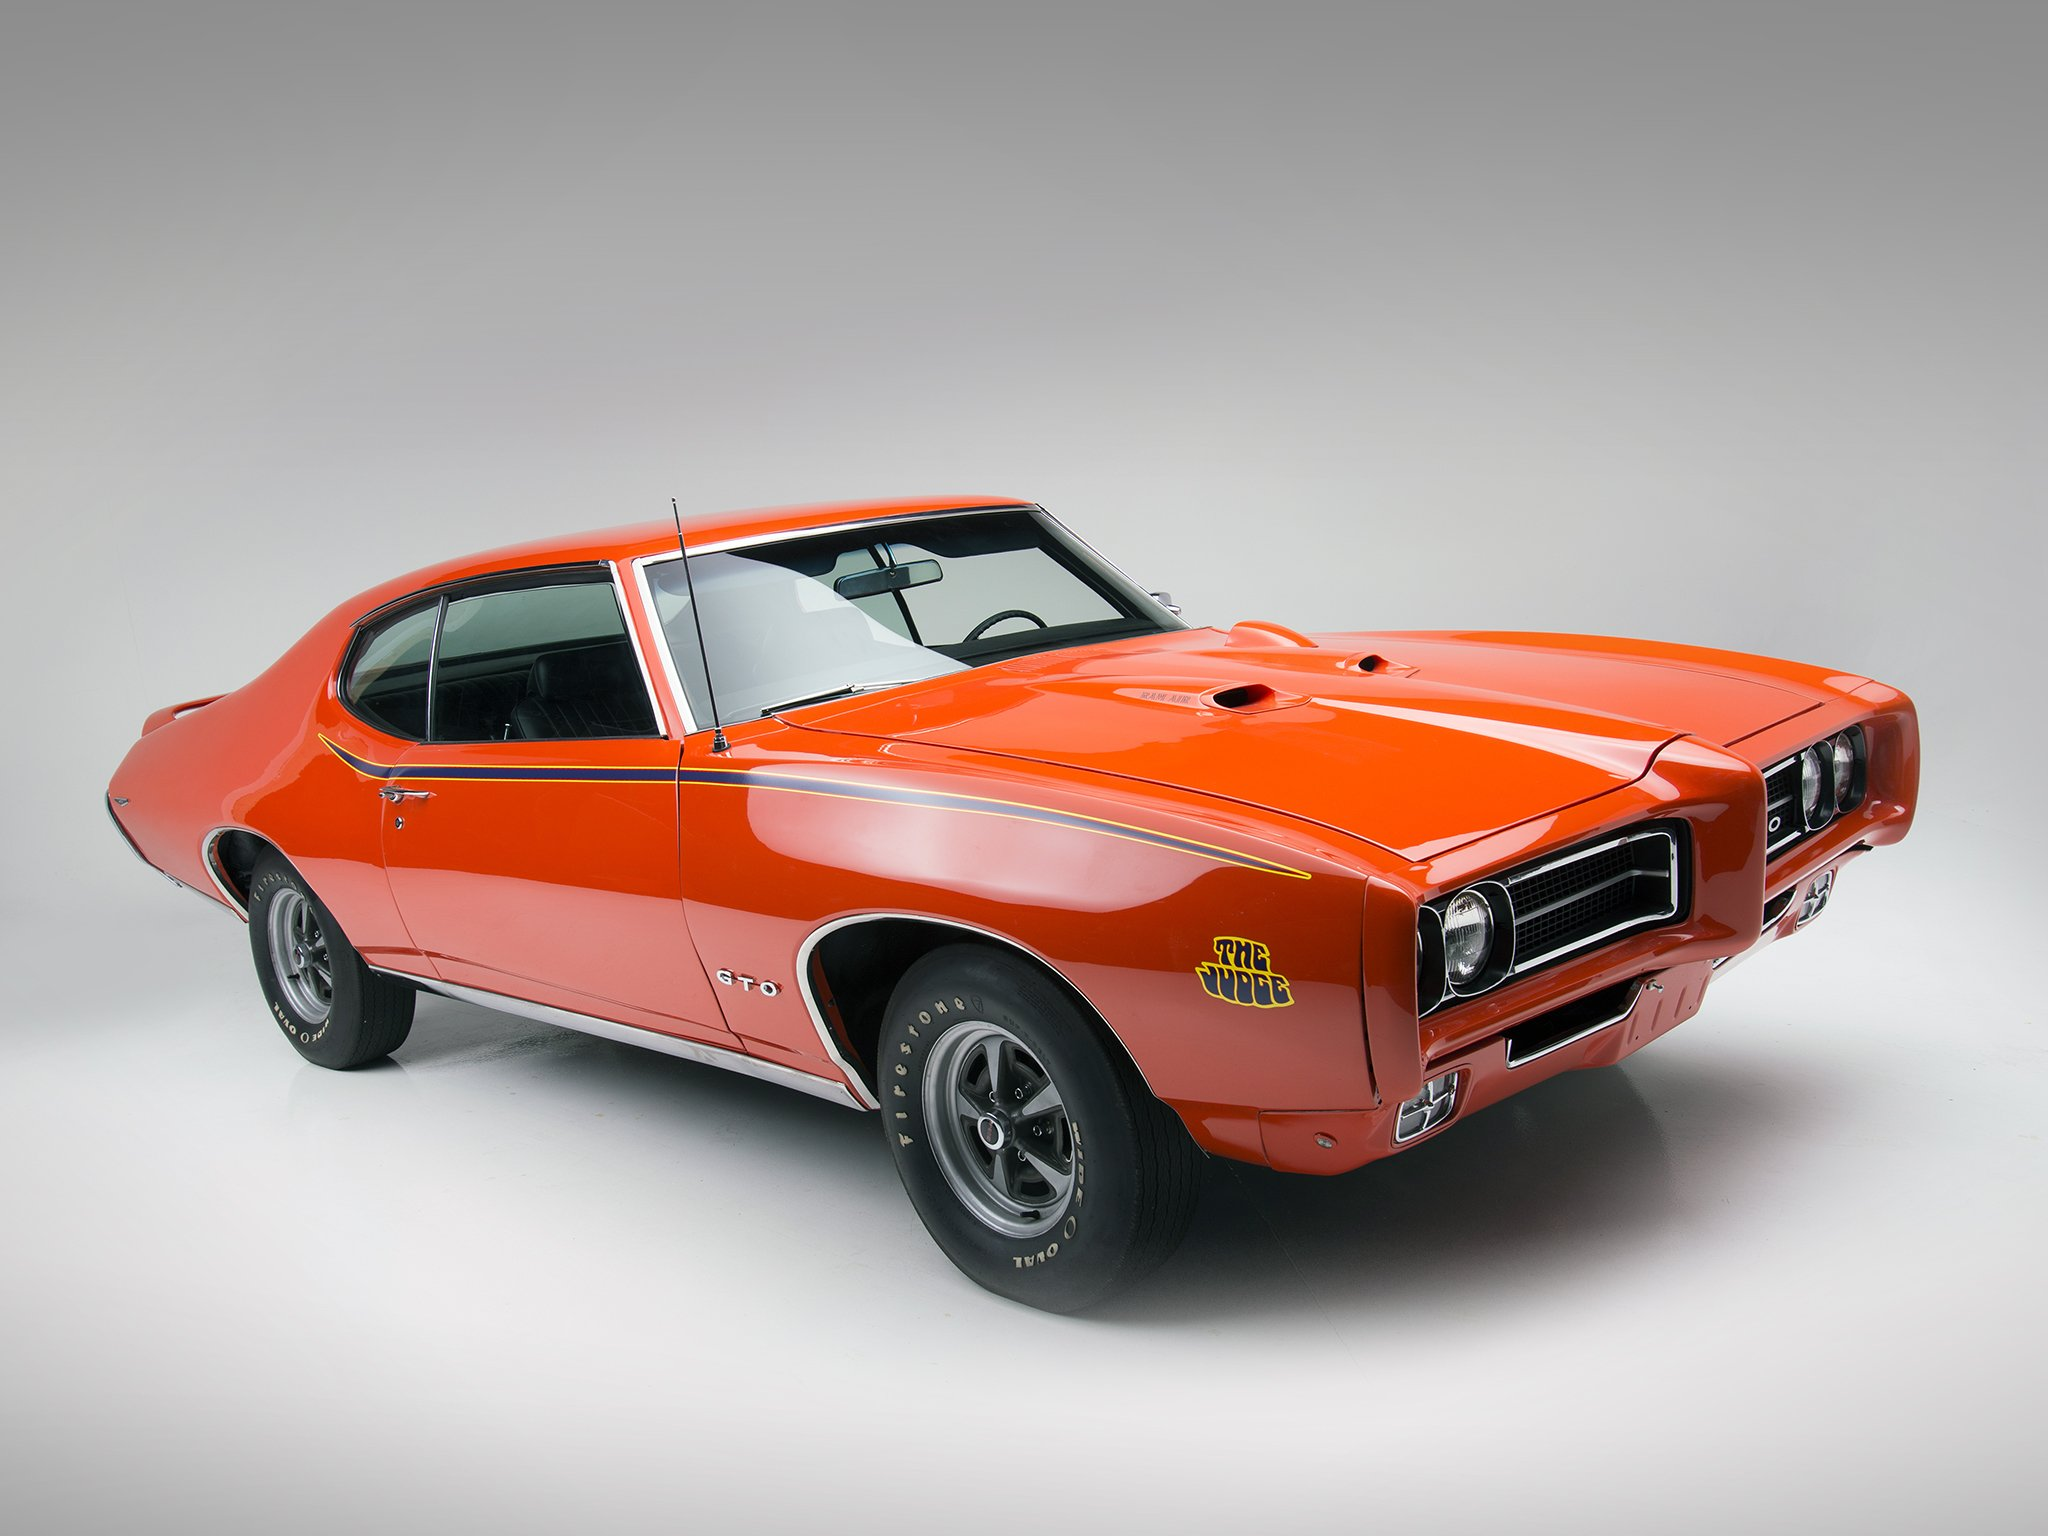 Pontiac Gto The Judge Hardtop Coupe 1969